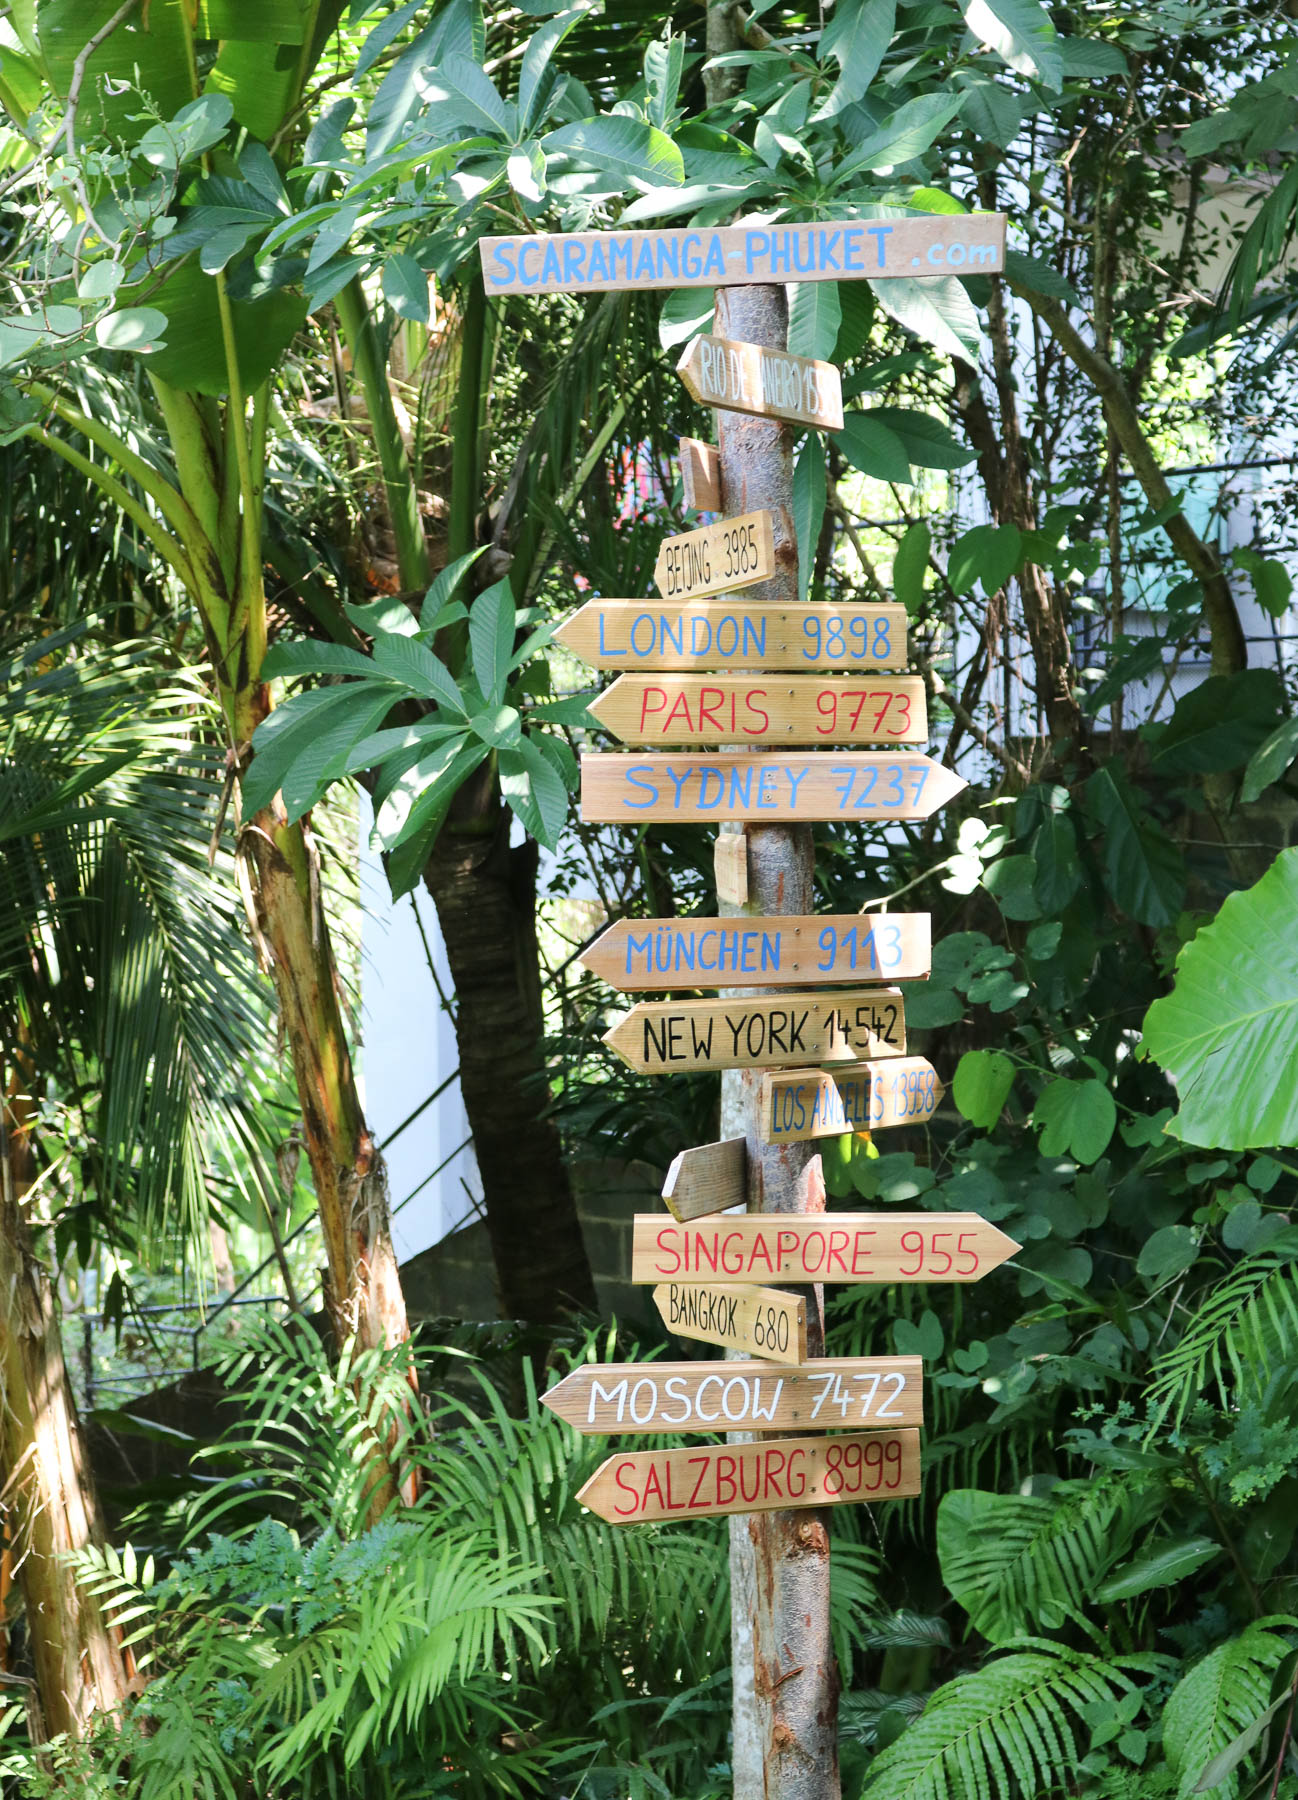 Airbnb Phuket, Thailand